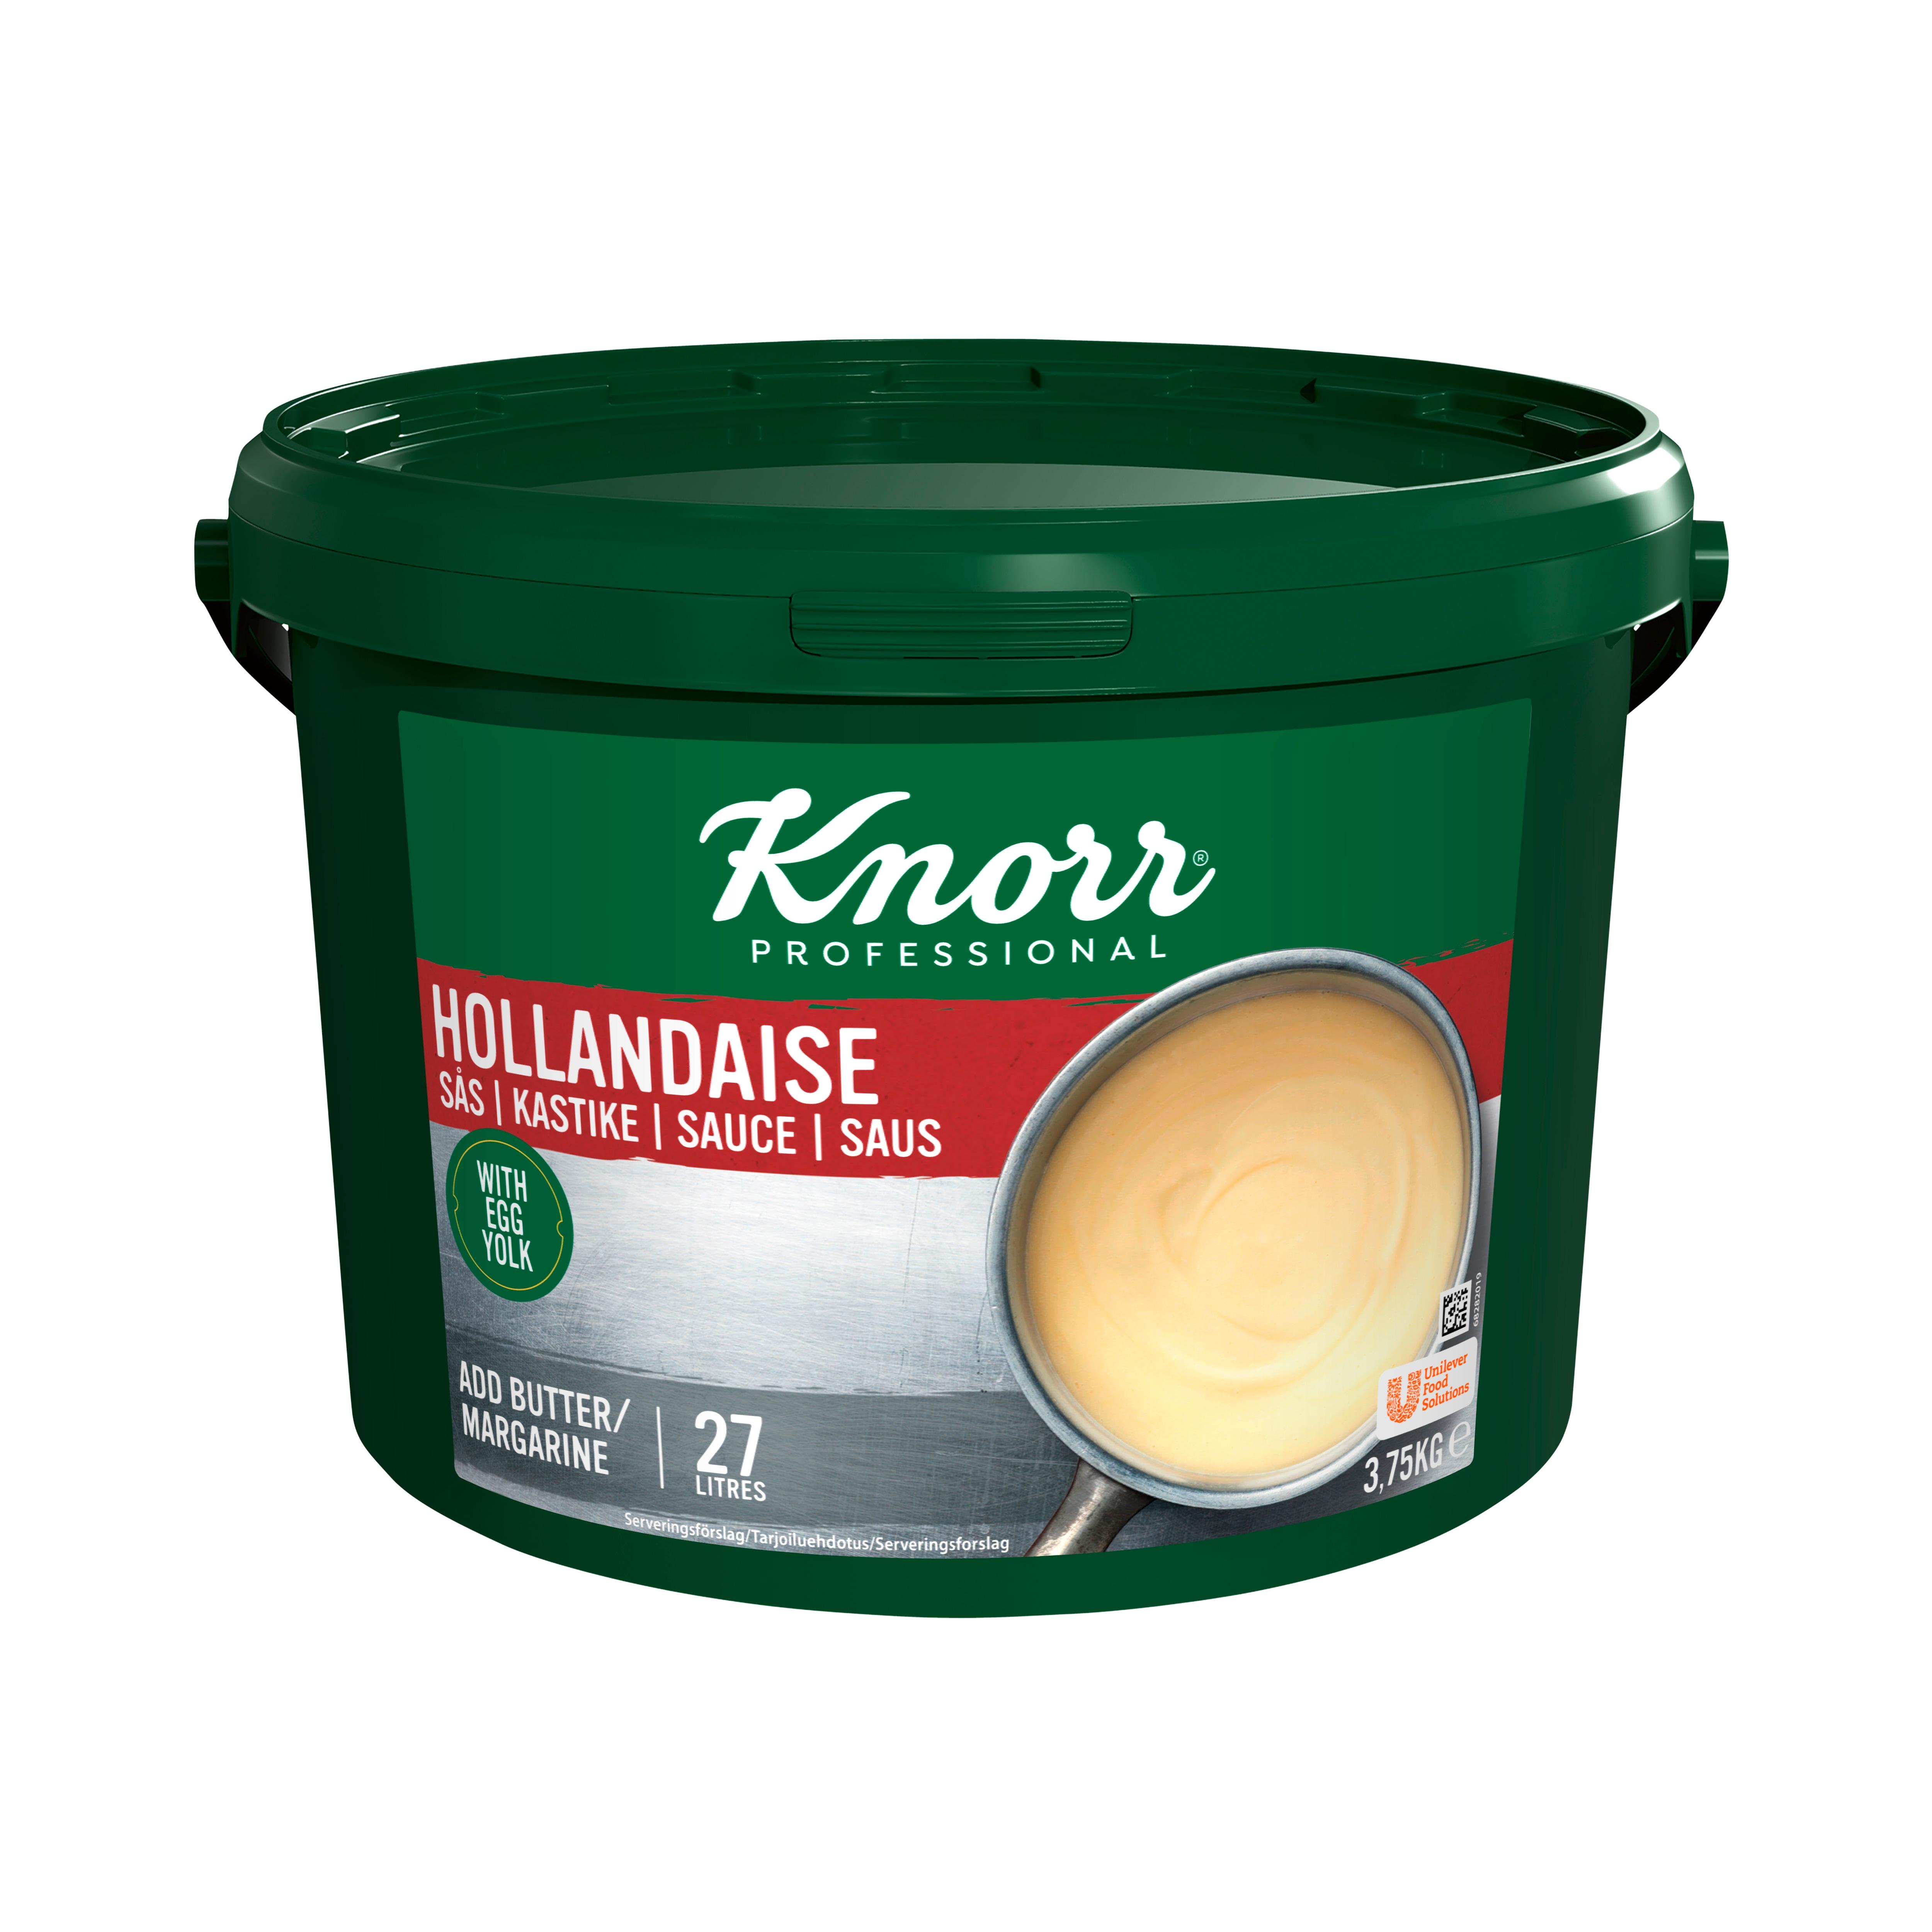 Knorr Hollandaisesås 1 x 3,75 kg -